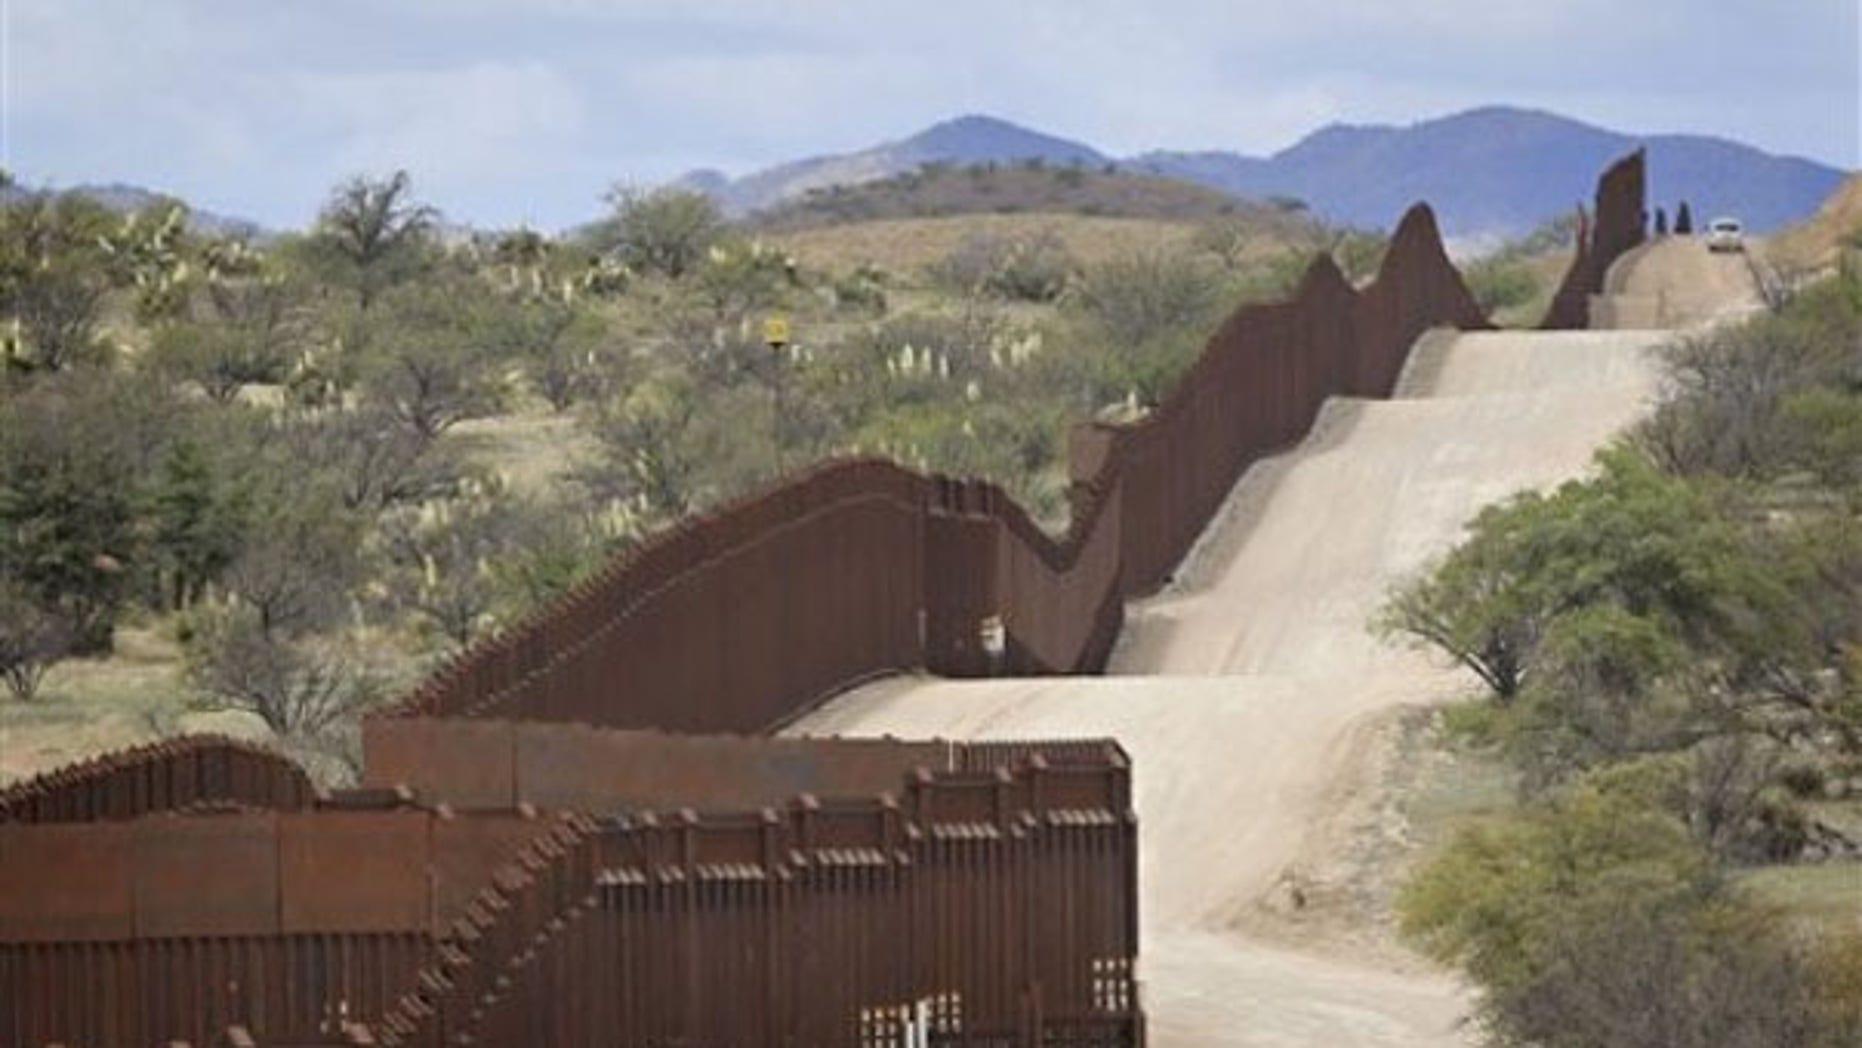 April 22: A Customs and Border Patrol agent patrols along the border in Nogales, Ariz. (AP Photo)